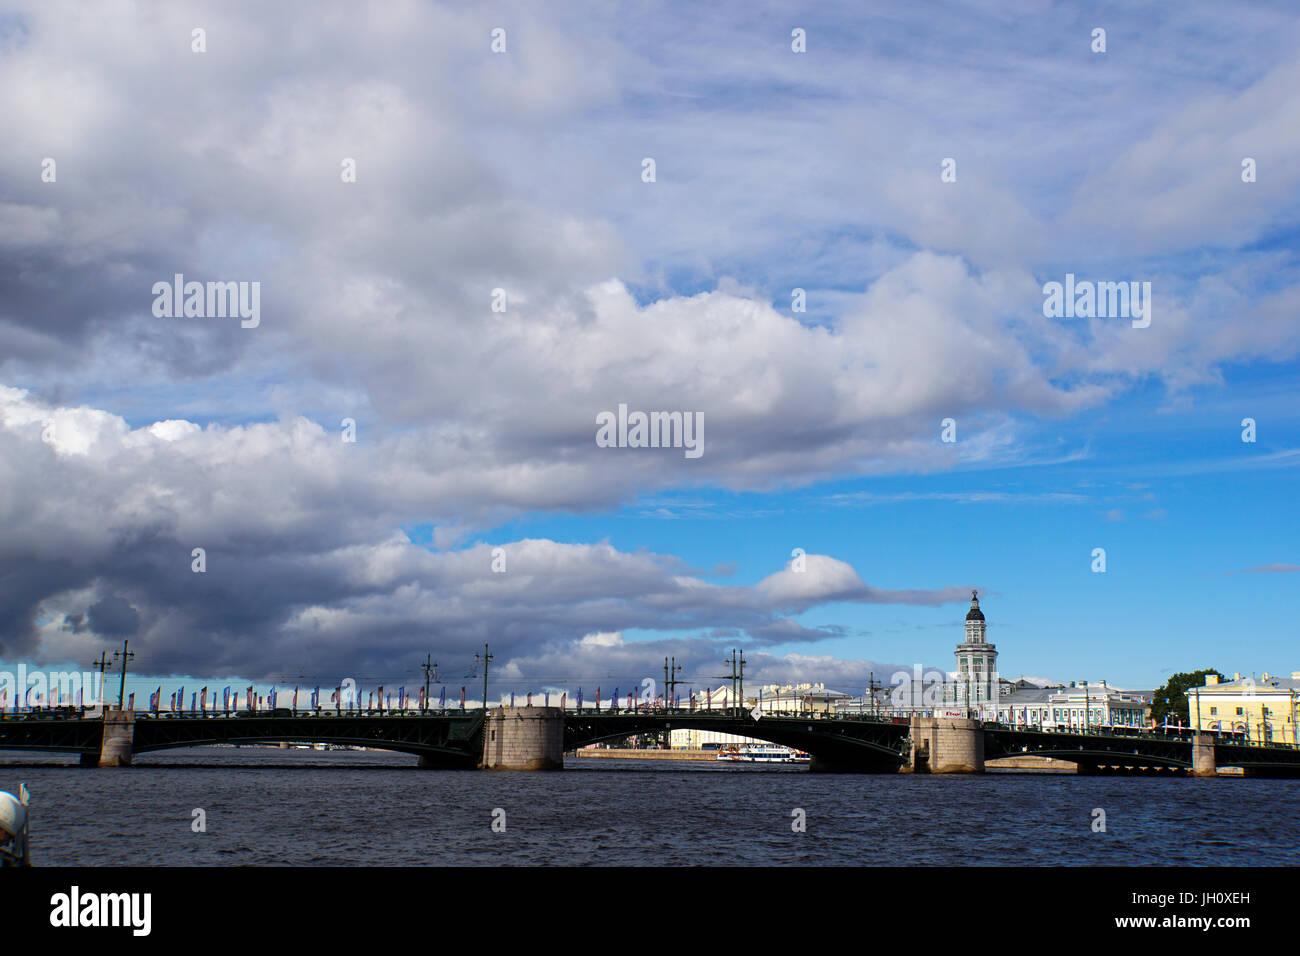 The Neva river cruise, St Petersburg, Russia - Stock Image